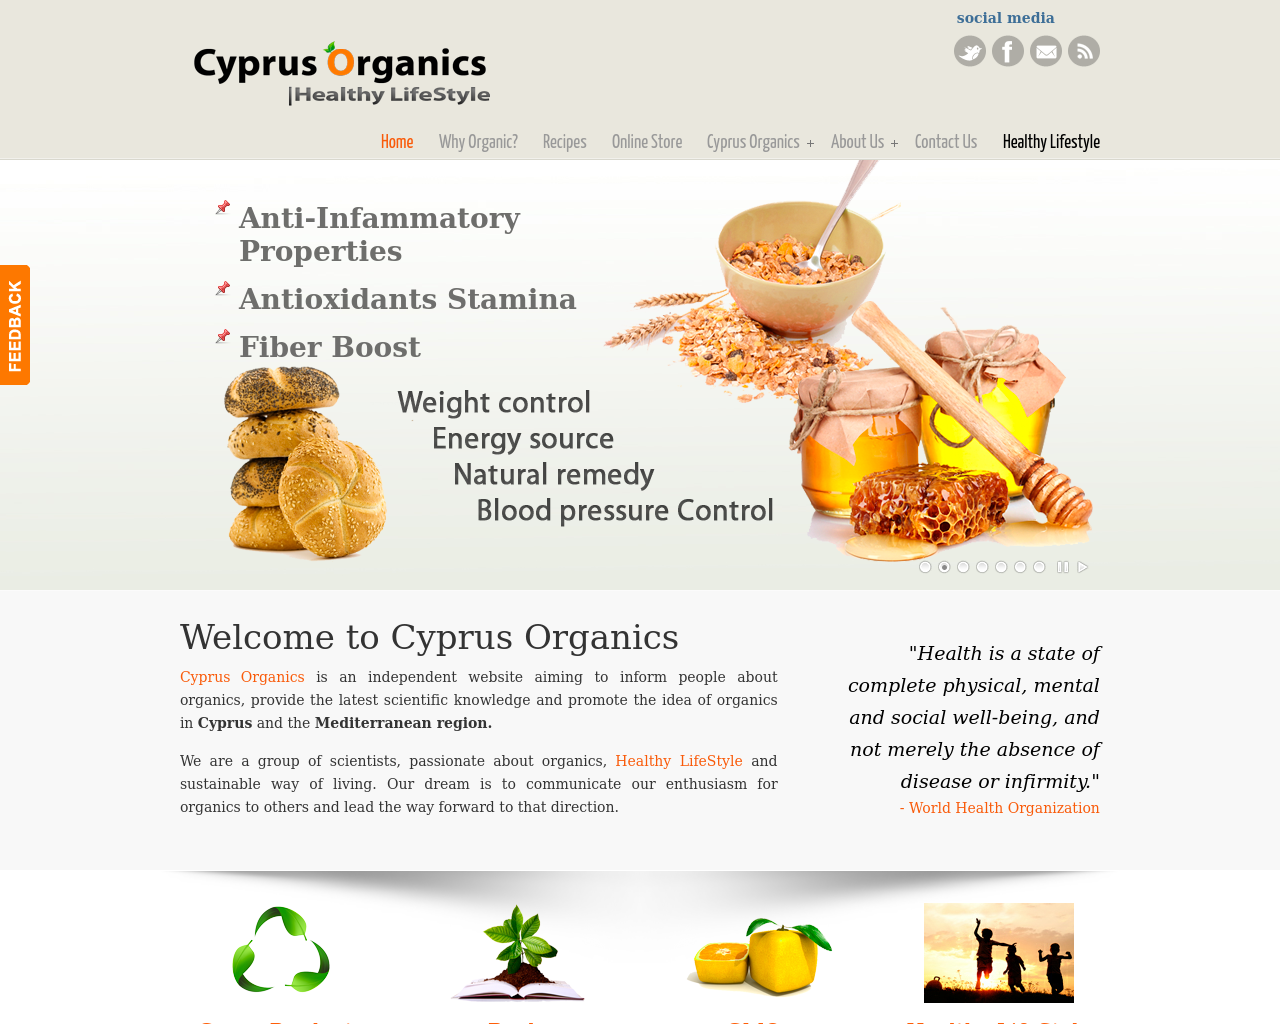 Cyprus-Organics-Advertising-Reviews-Pricing